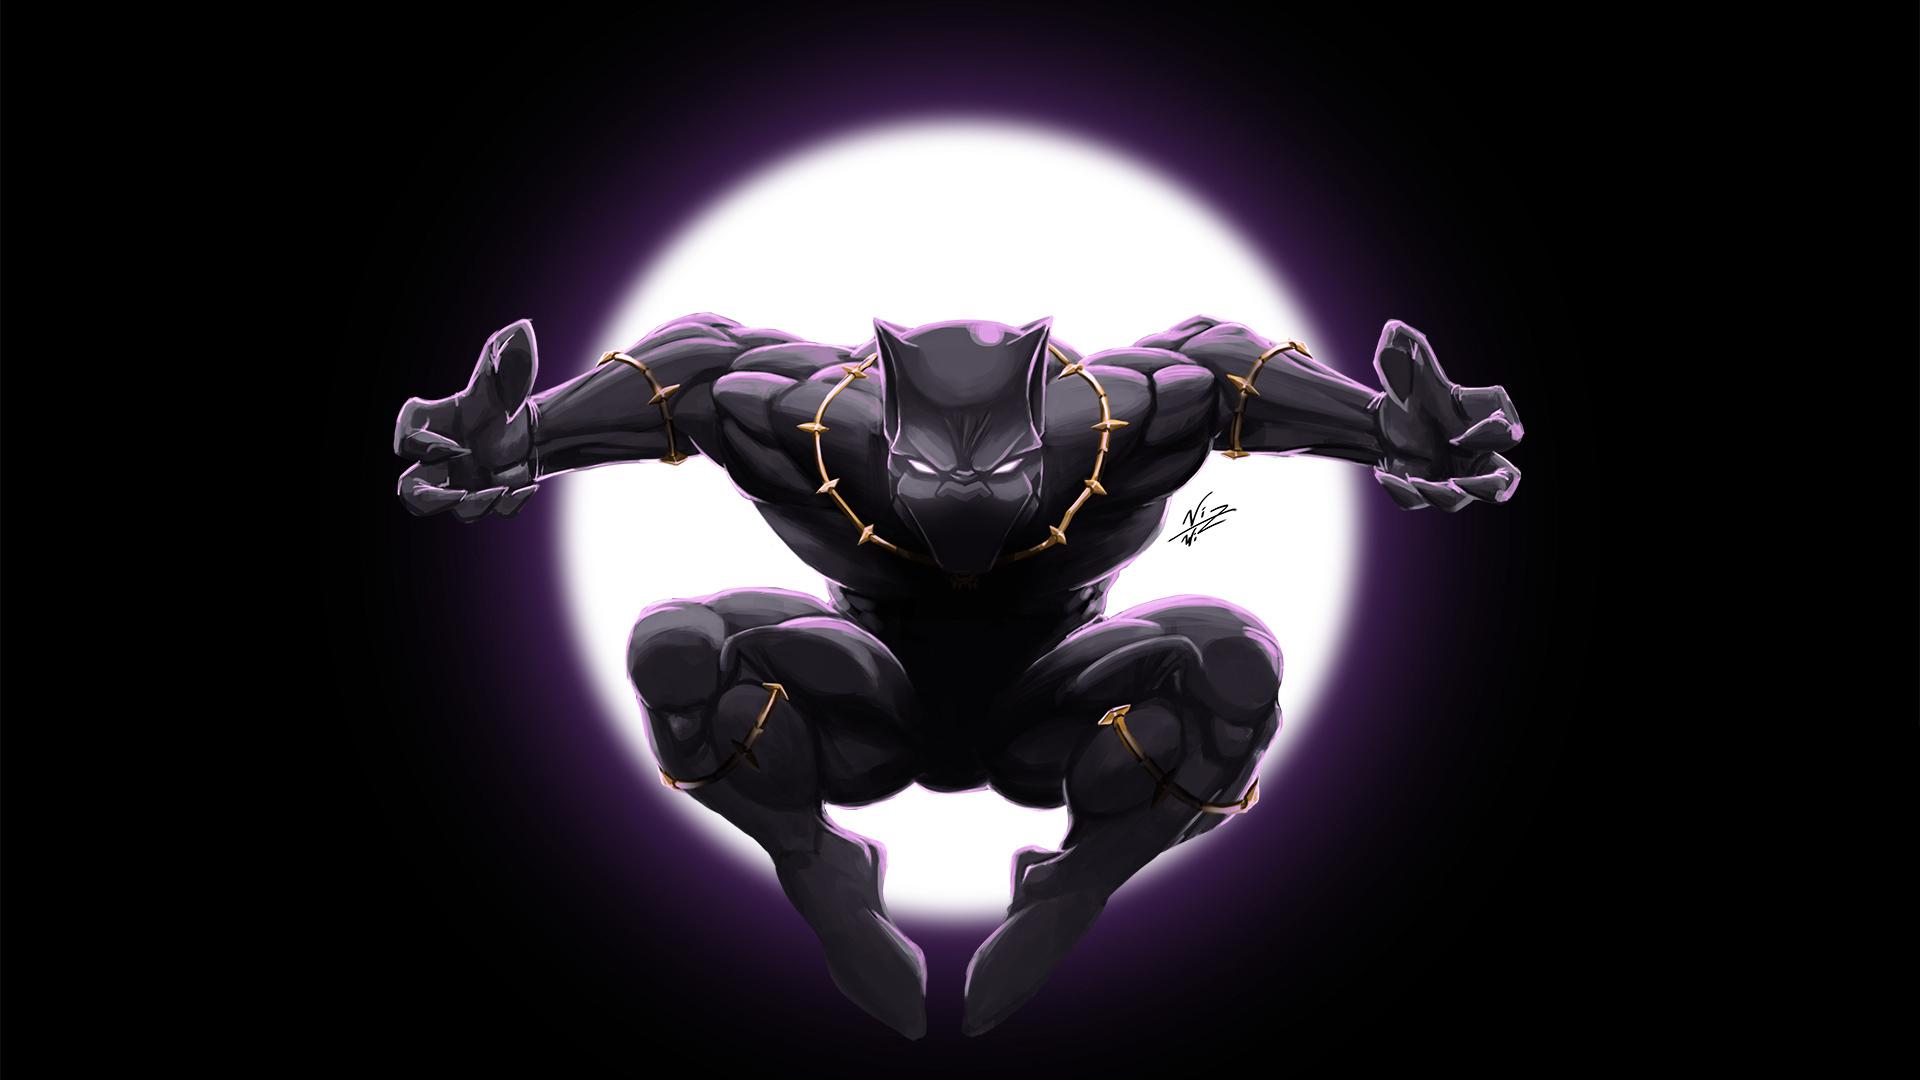 1920x1080 Art Black Panther Laptop Full HD 1080P HD 4k ...